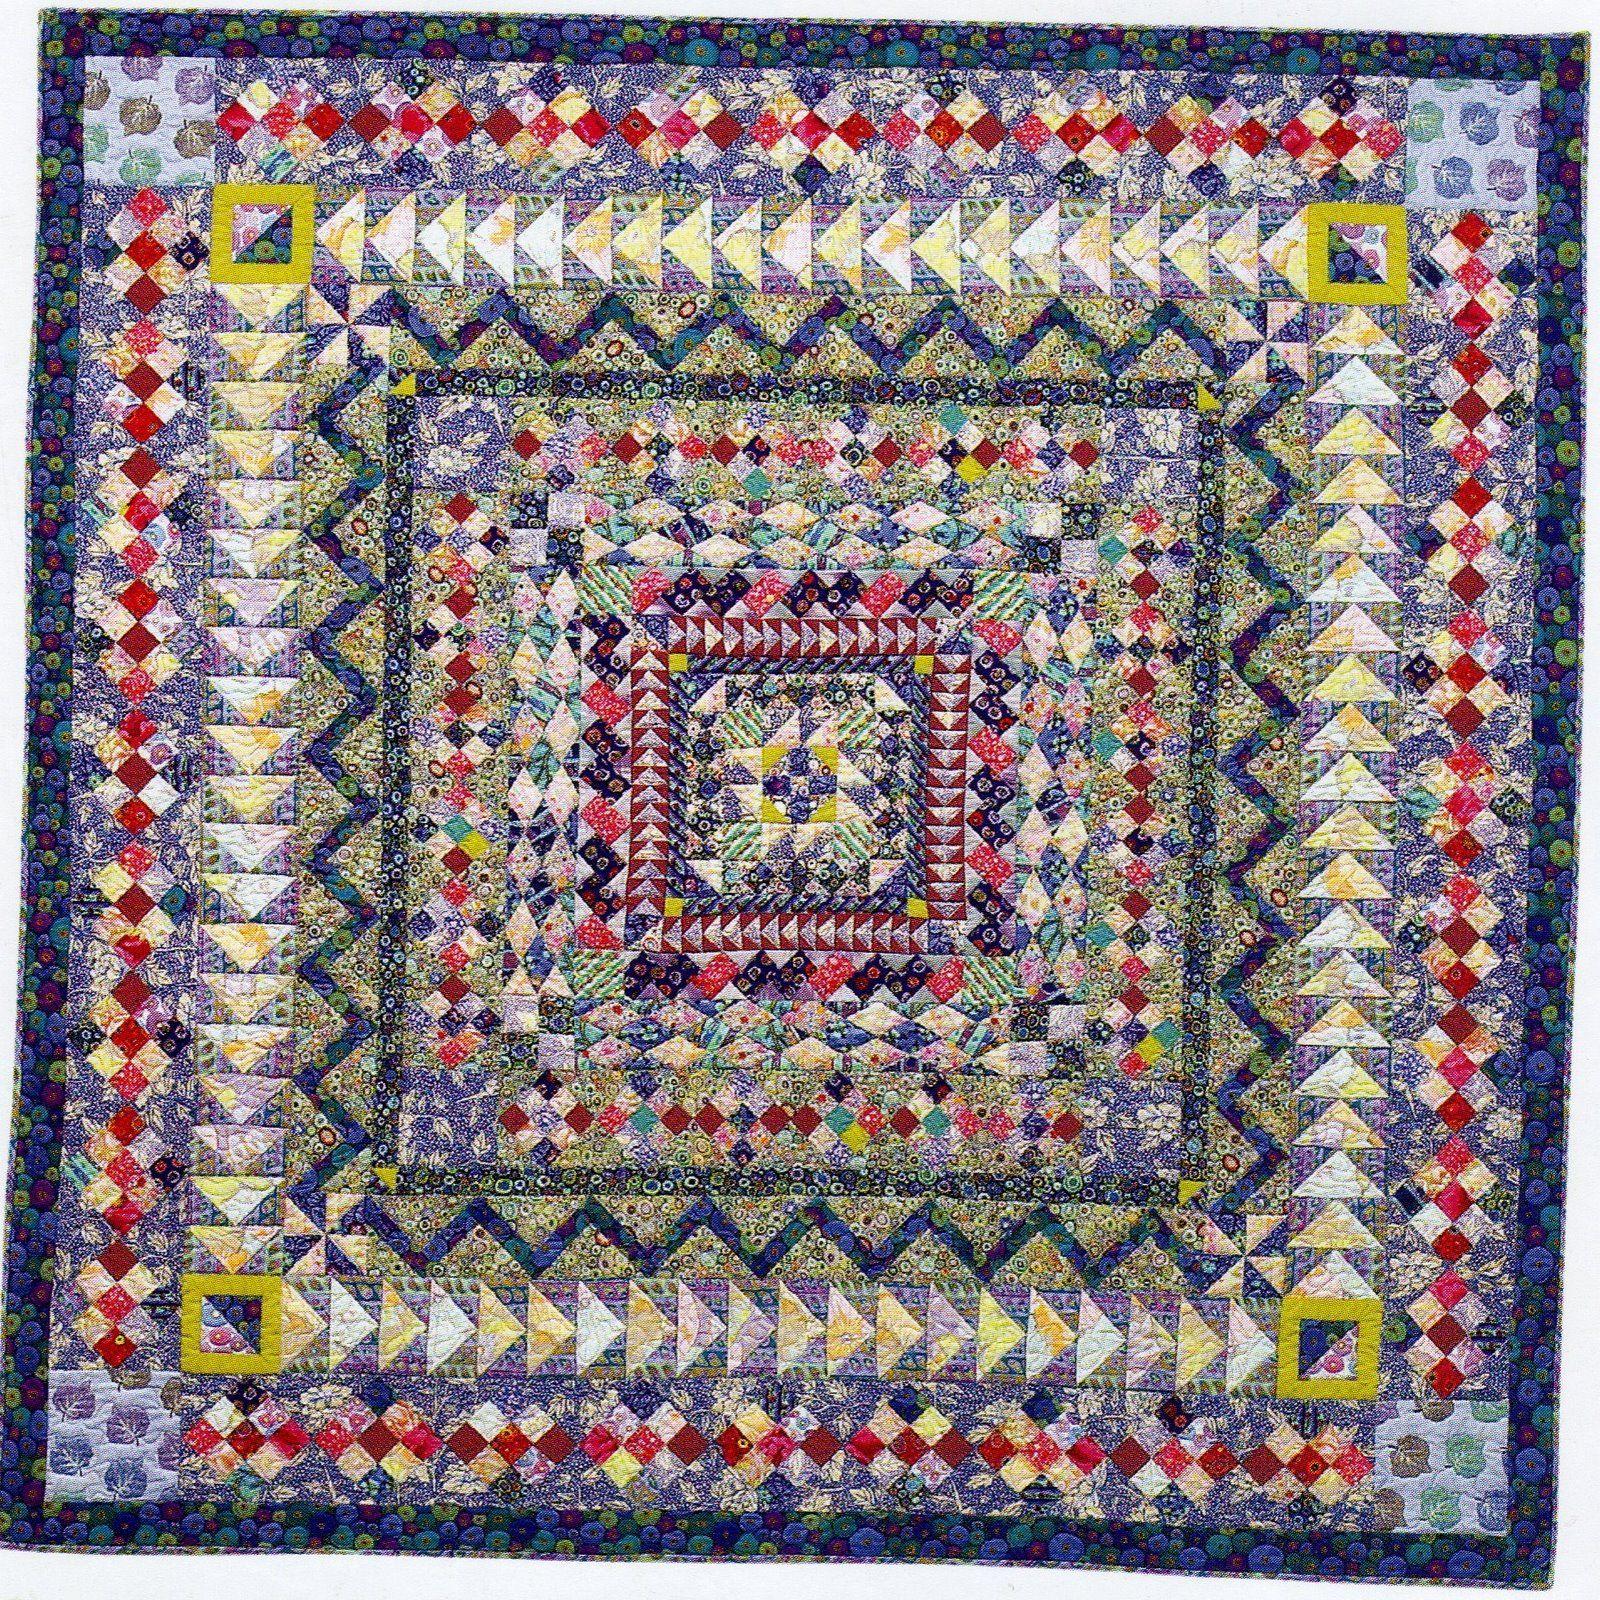 Alewivesgirl Kaffe Fassett Botm Medallion Quilt Kaffe Fassett Quilts Quilts